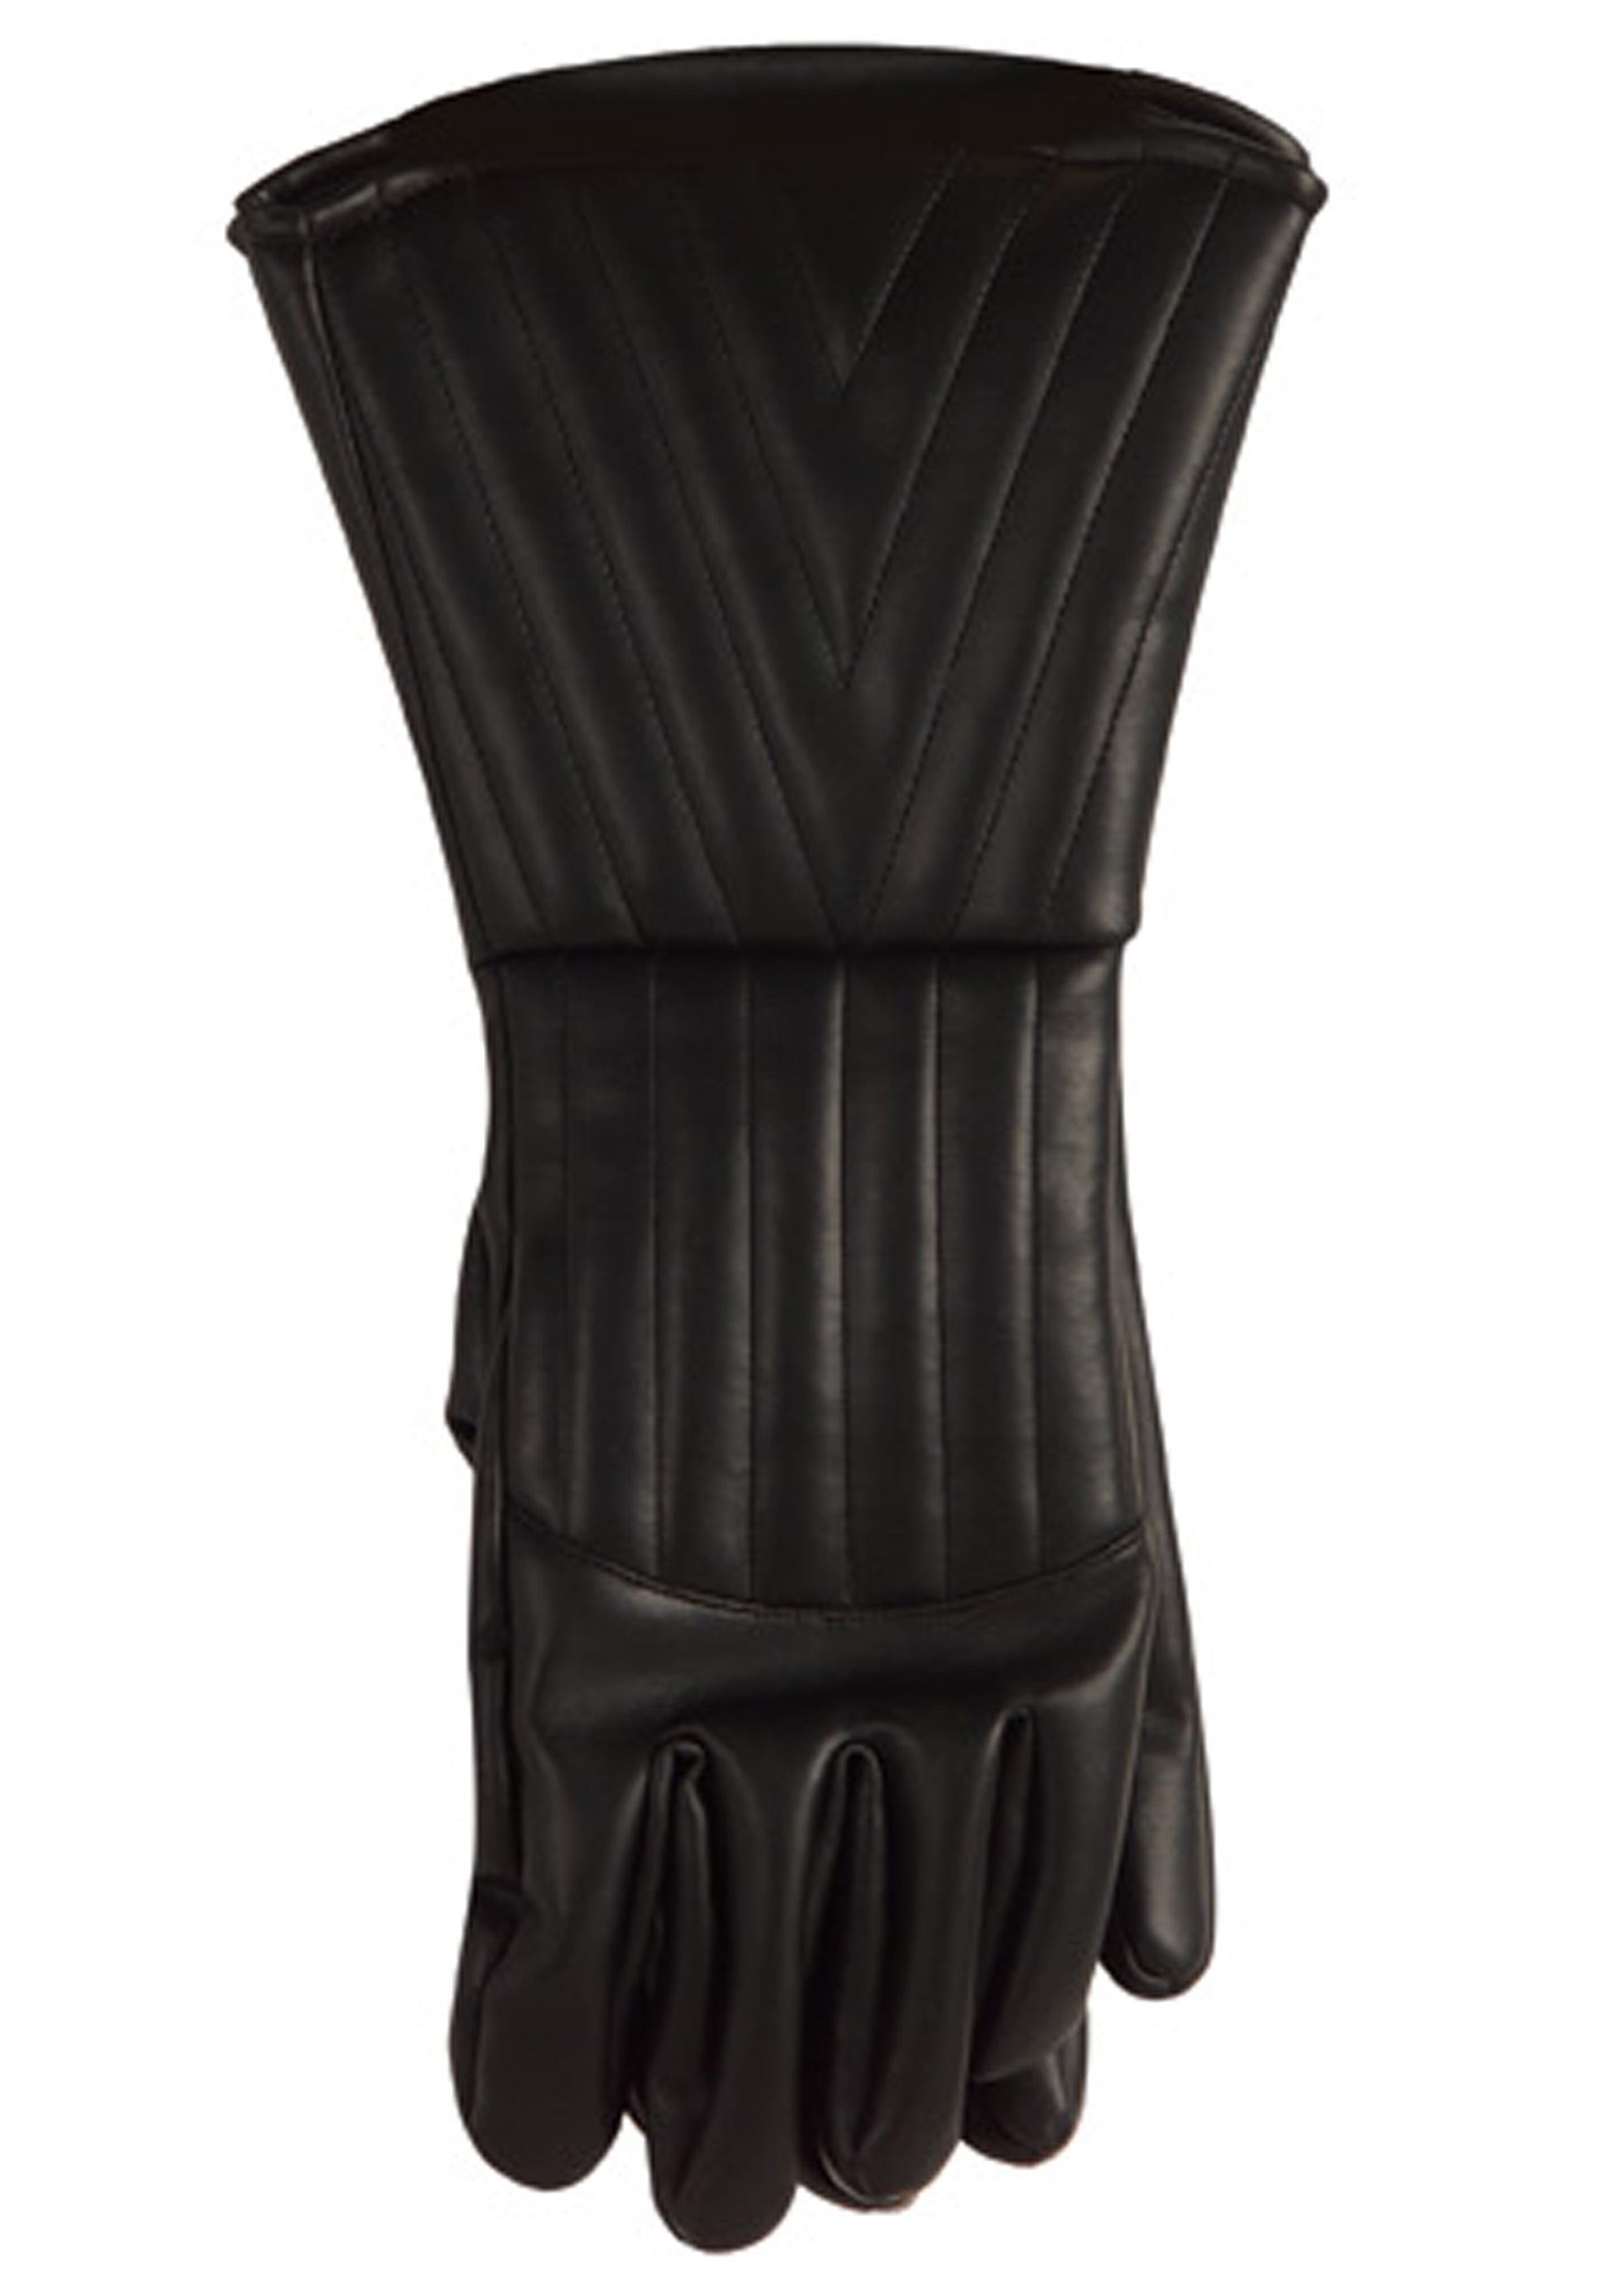 Adult Realistic Star Wars Darth Vader Gloves RU1197